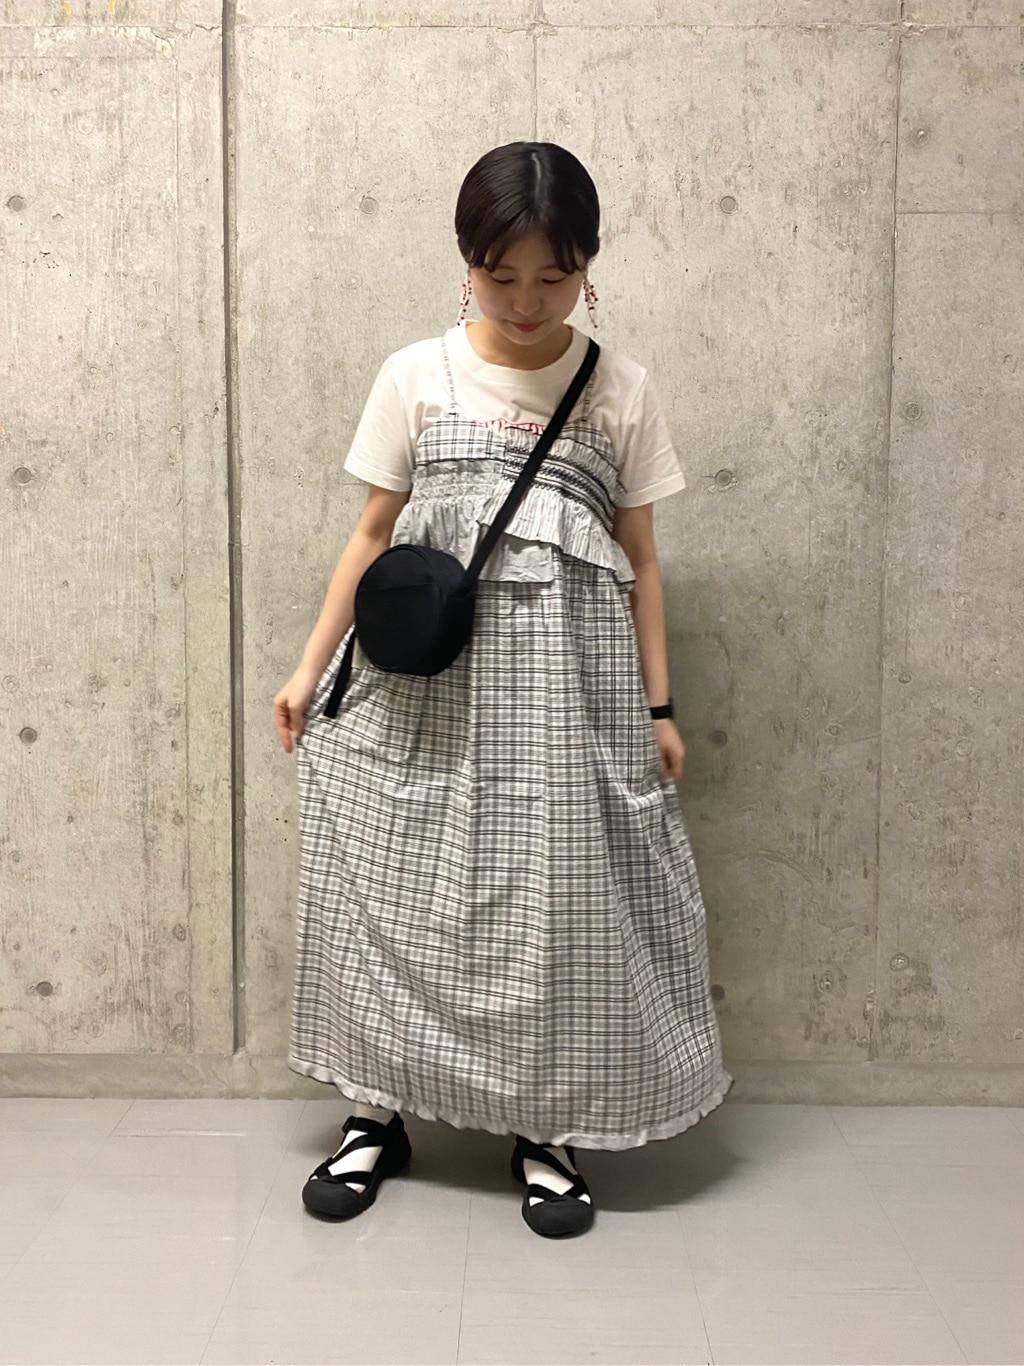 bulle de savon 阪急西宮ガーデンズ 身長:149cm 2021.06.10